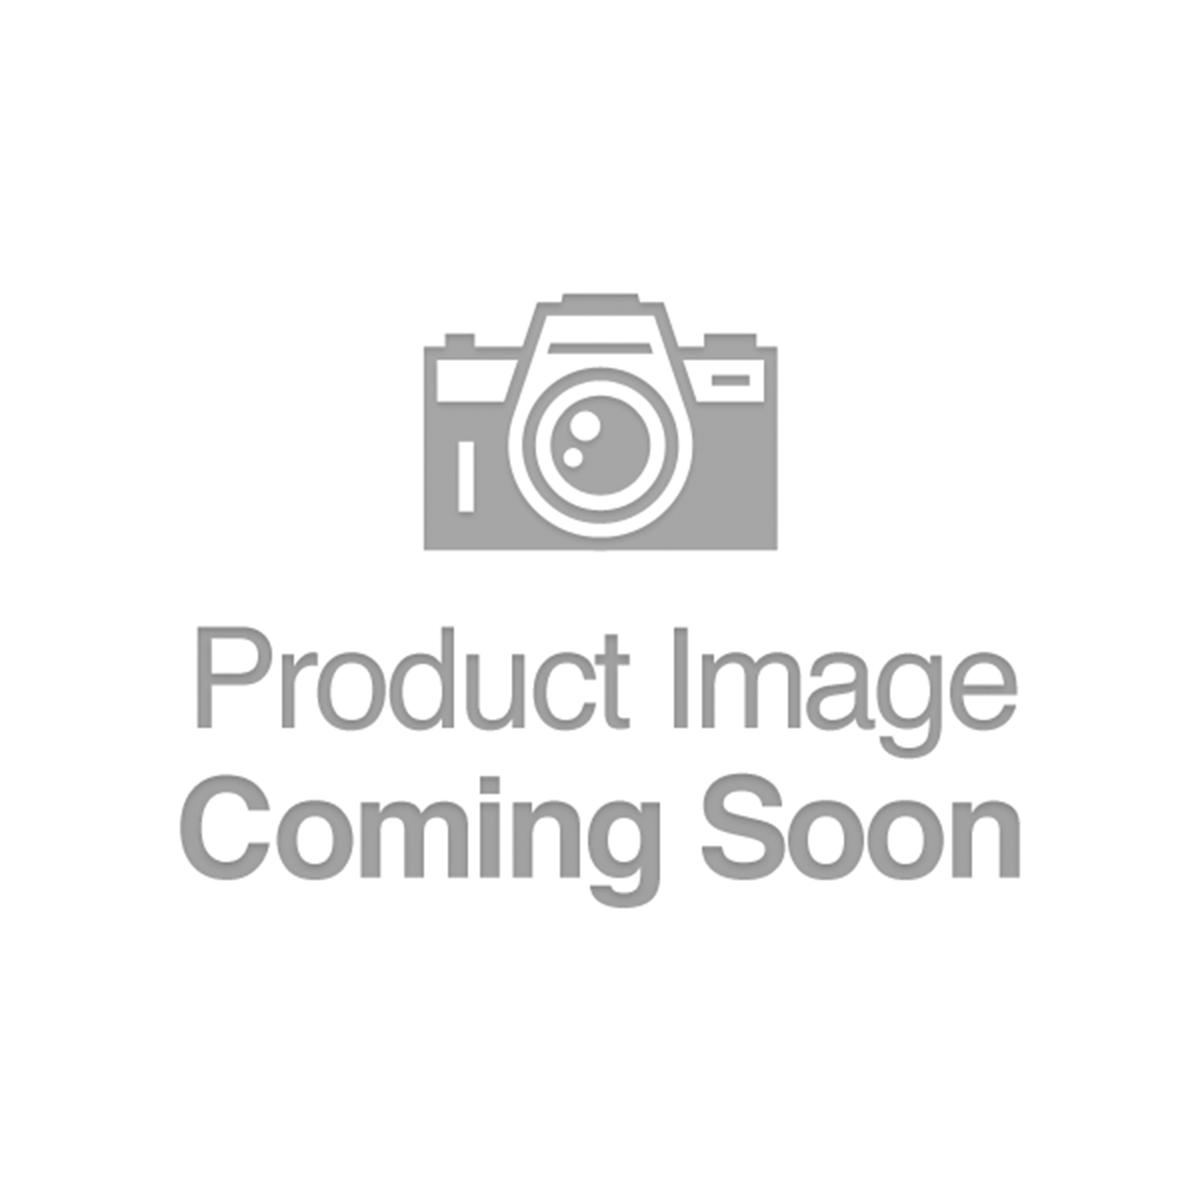 1881 3CN Three Cent Nickel PCGS PR66 (CAC)